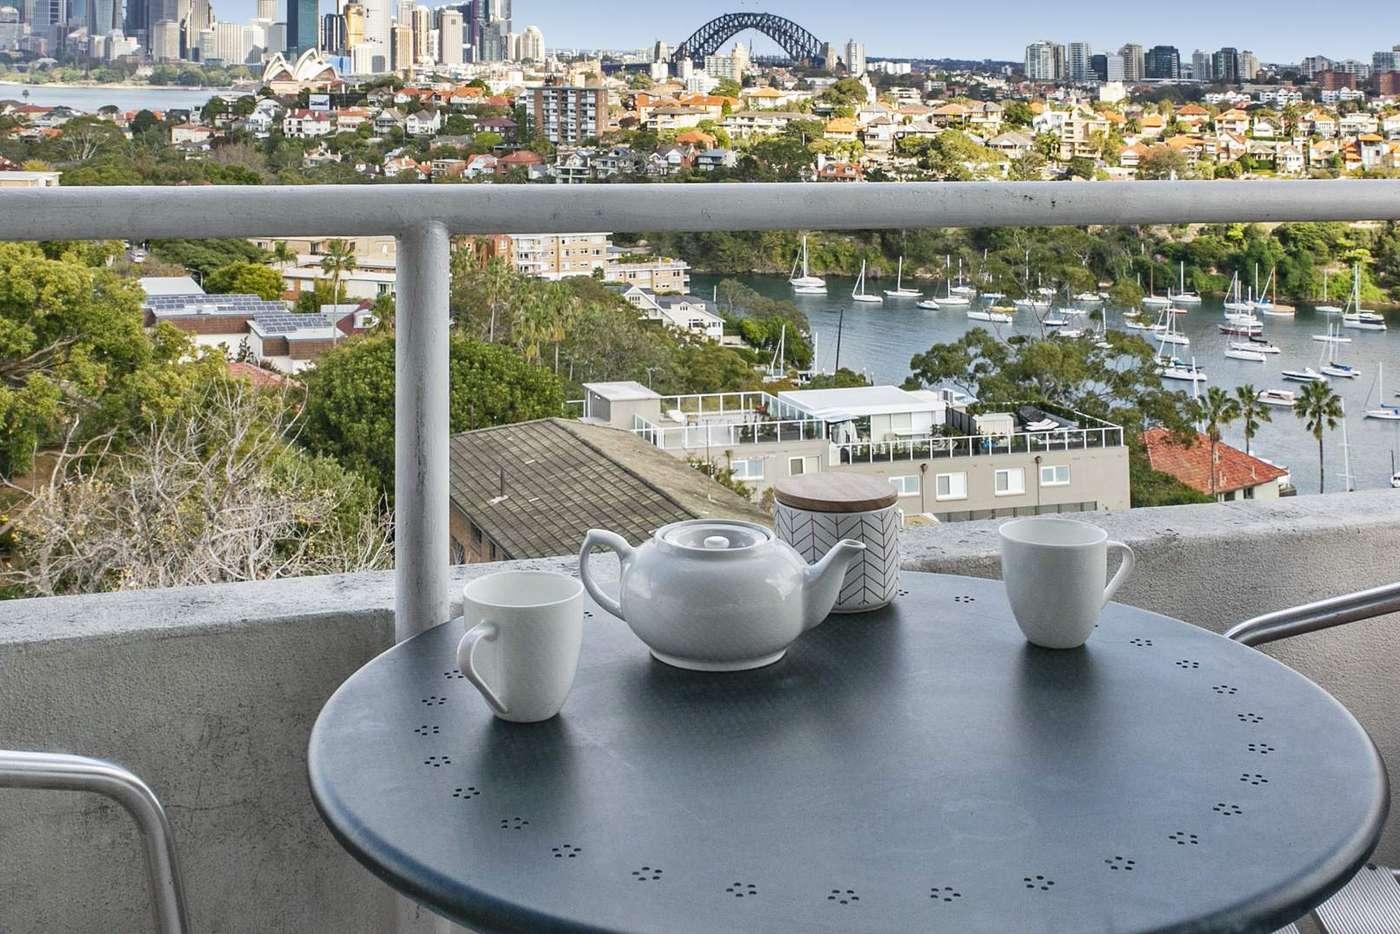 Main view of Homely apartment listing, 60/22 Mosman Street, Mosman NSW 2088